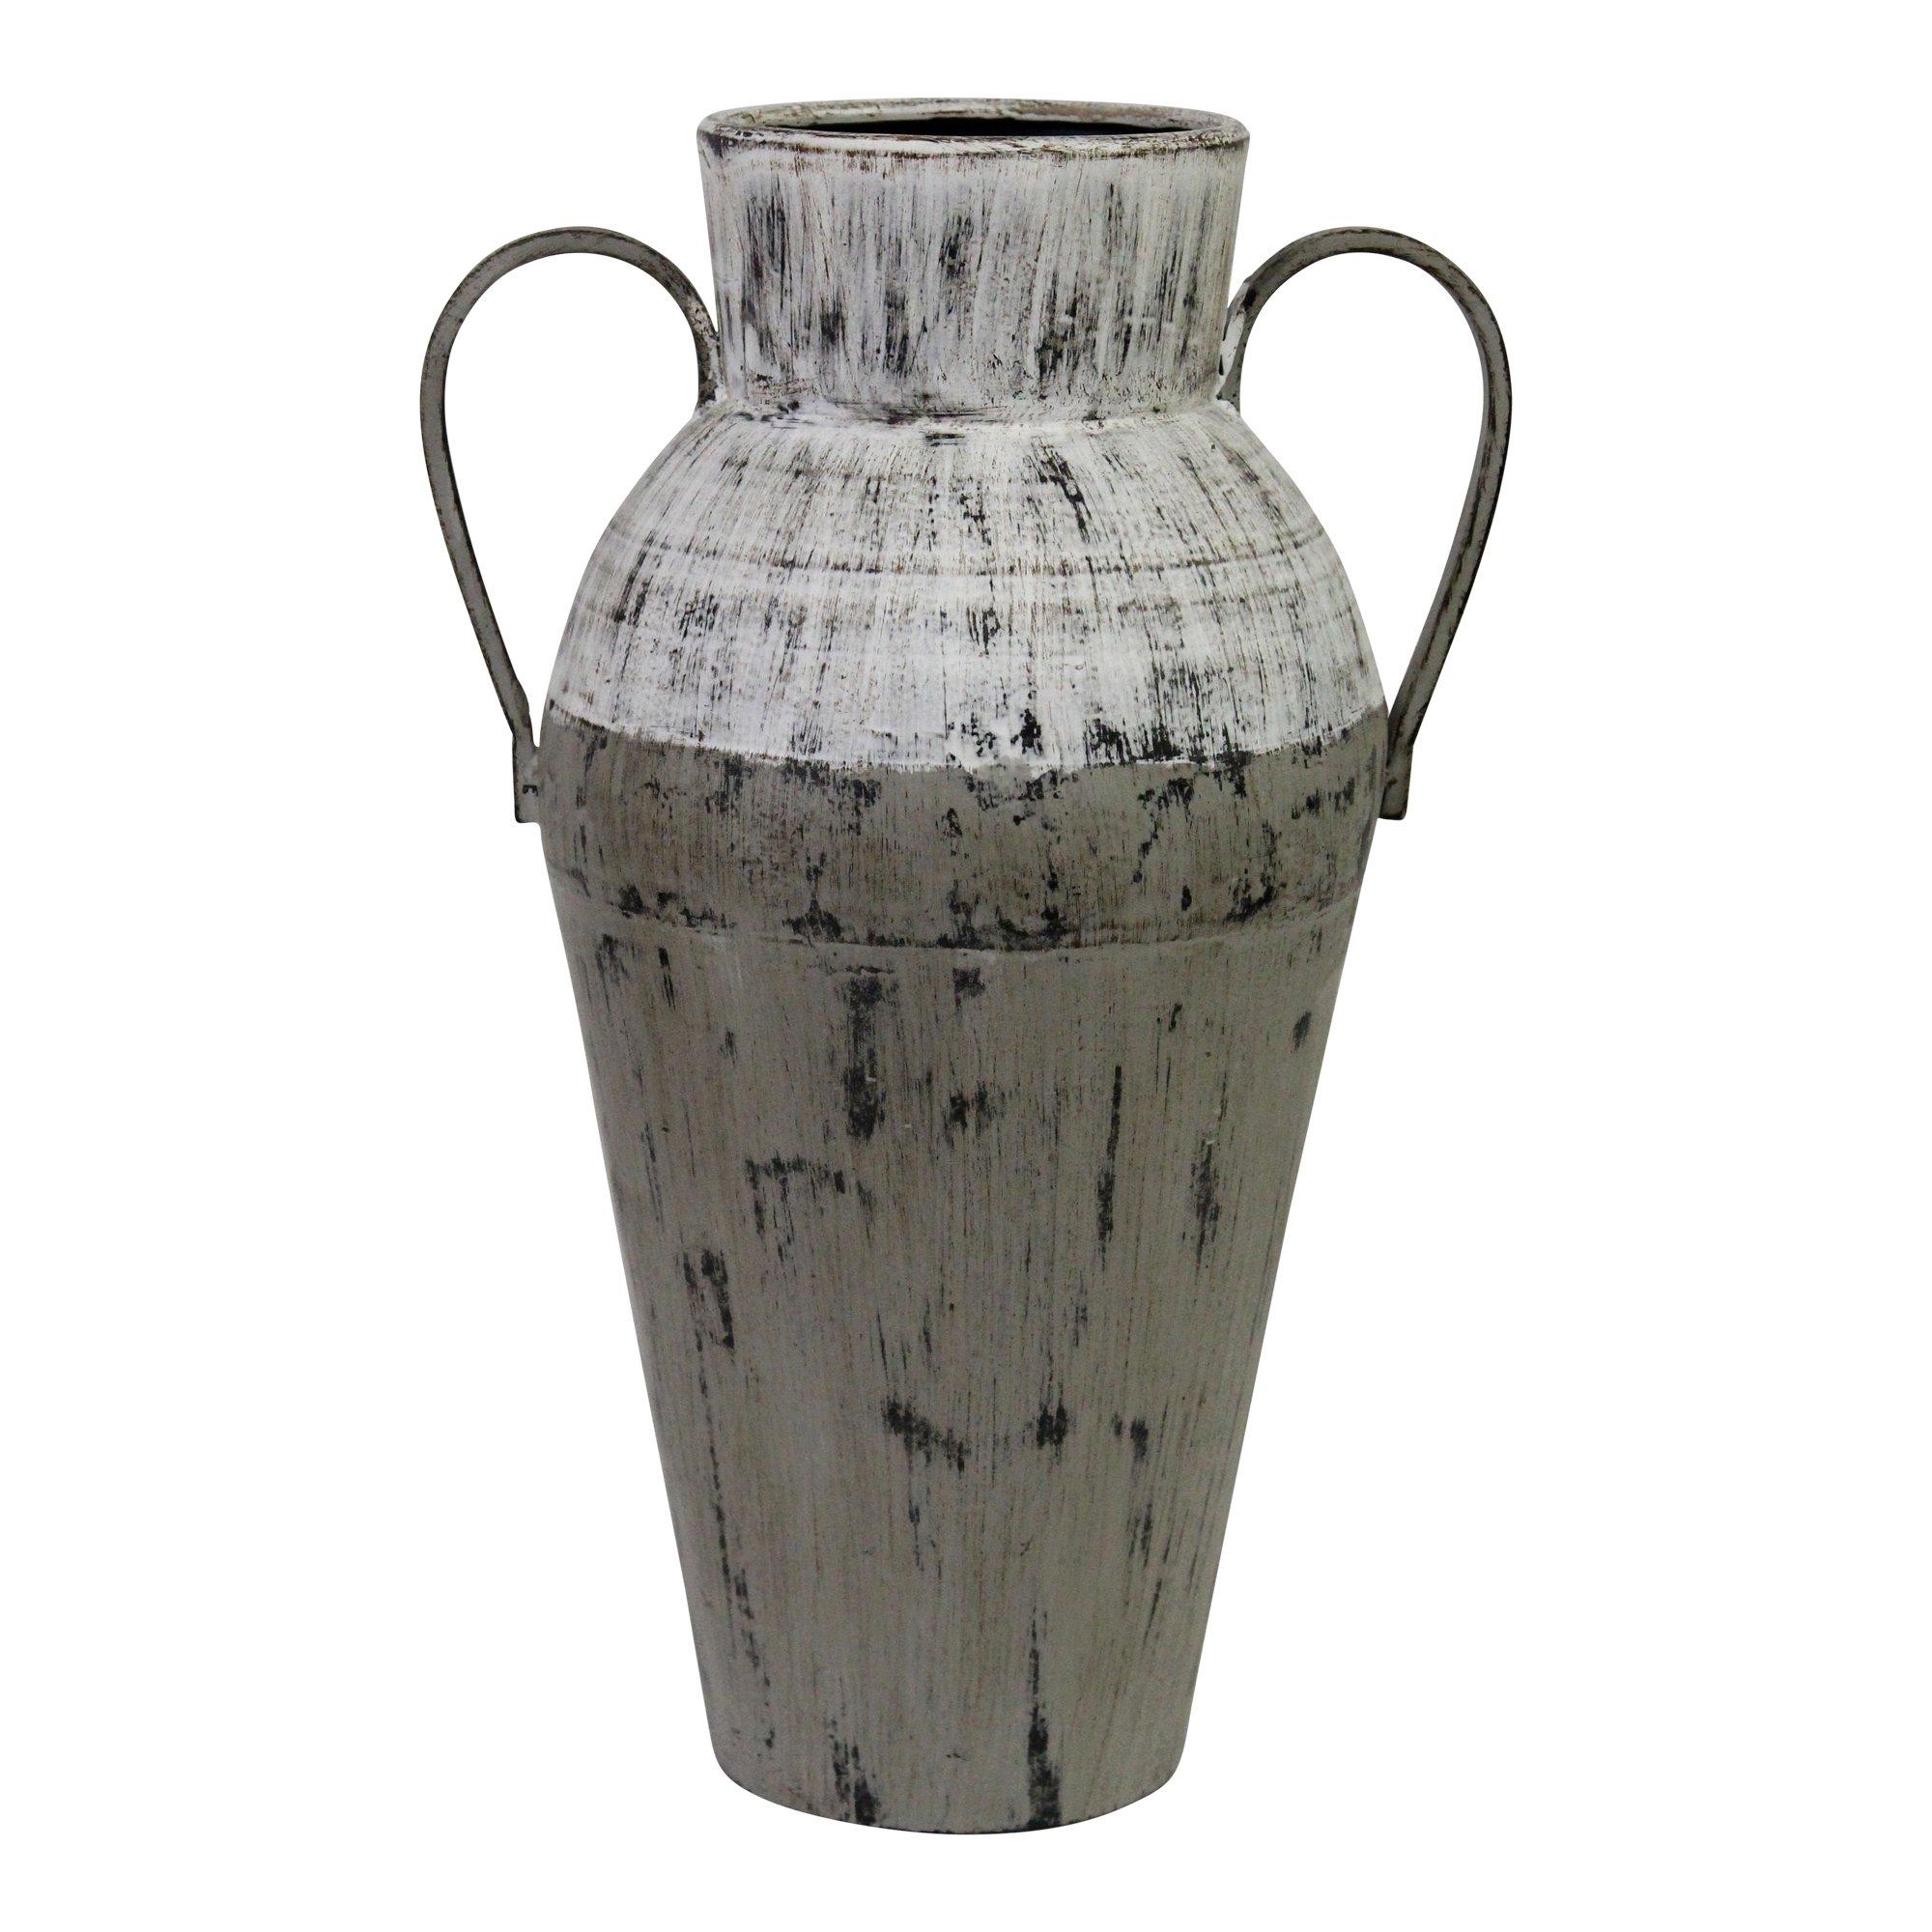 Tall Aged Look Distressed Metal Vase